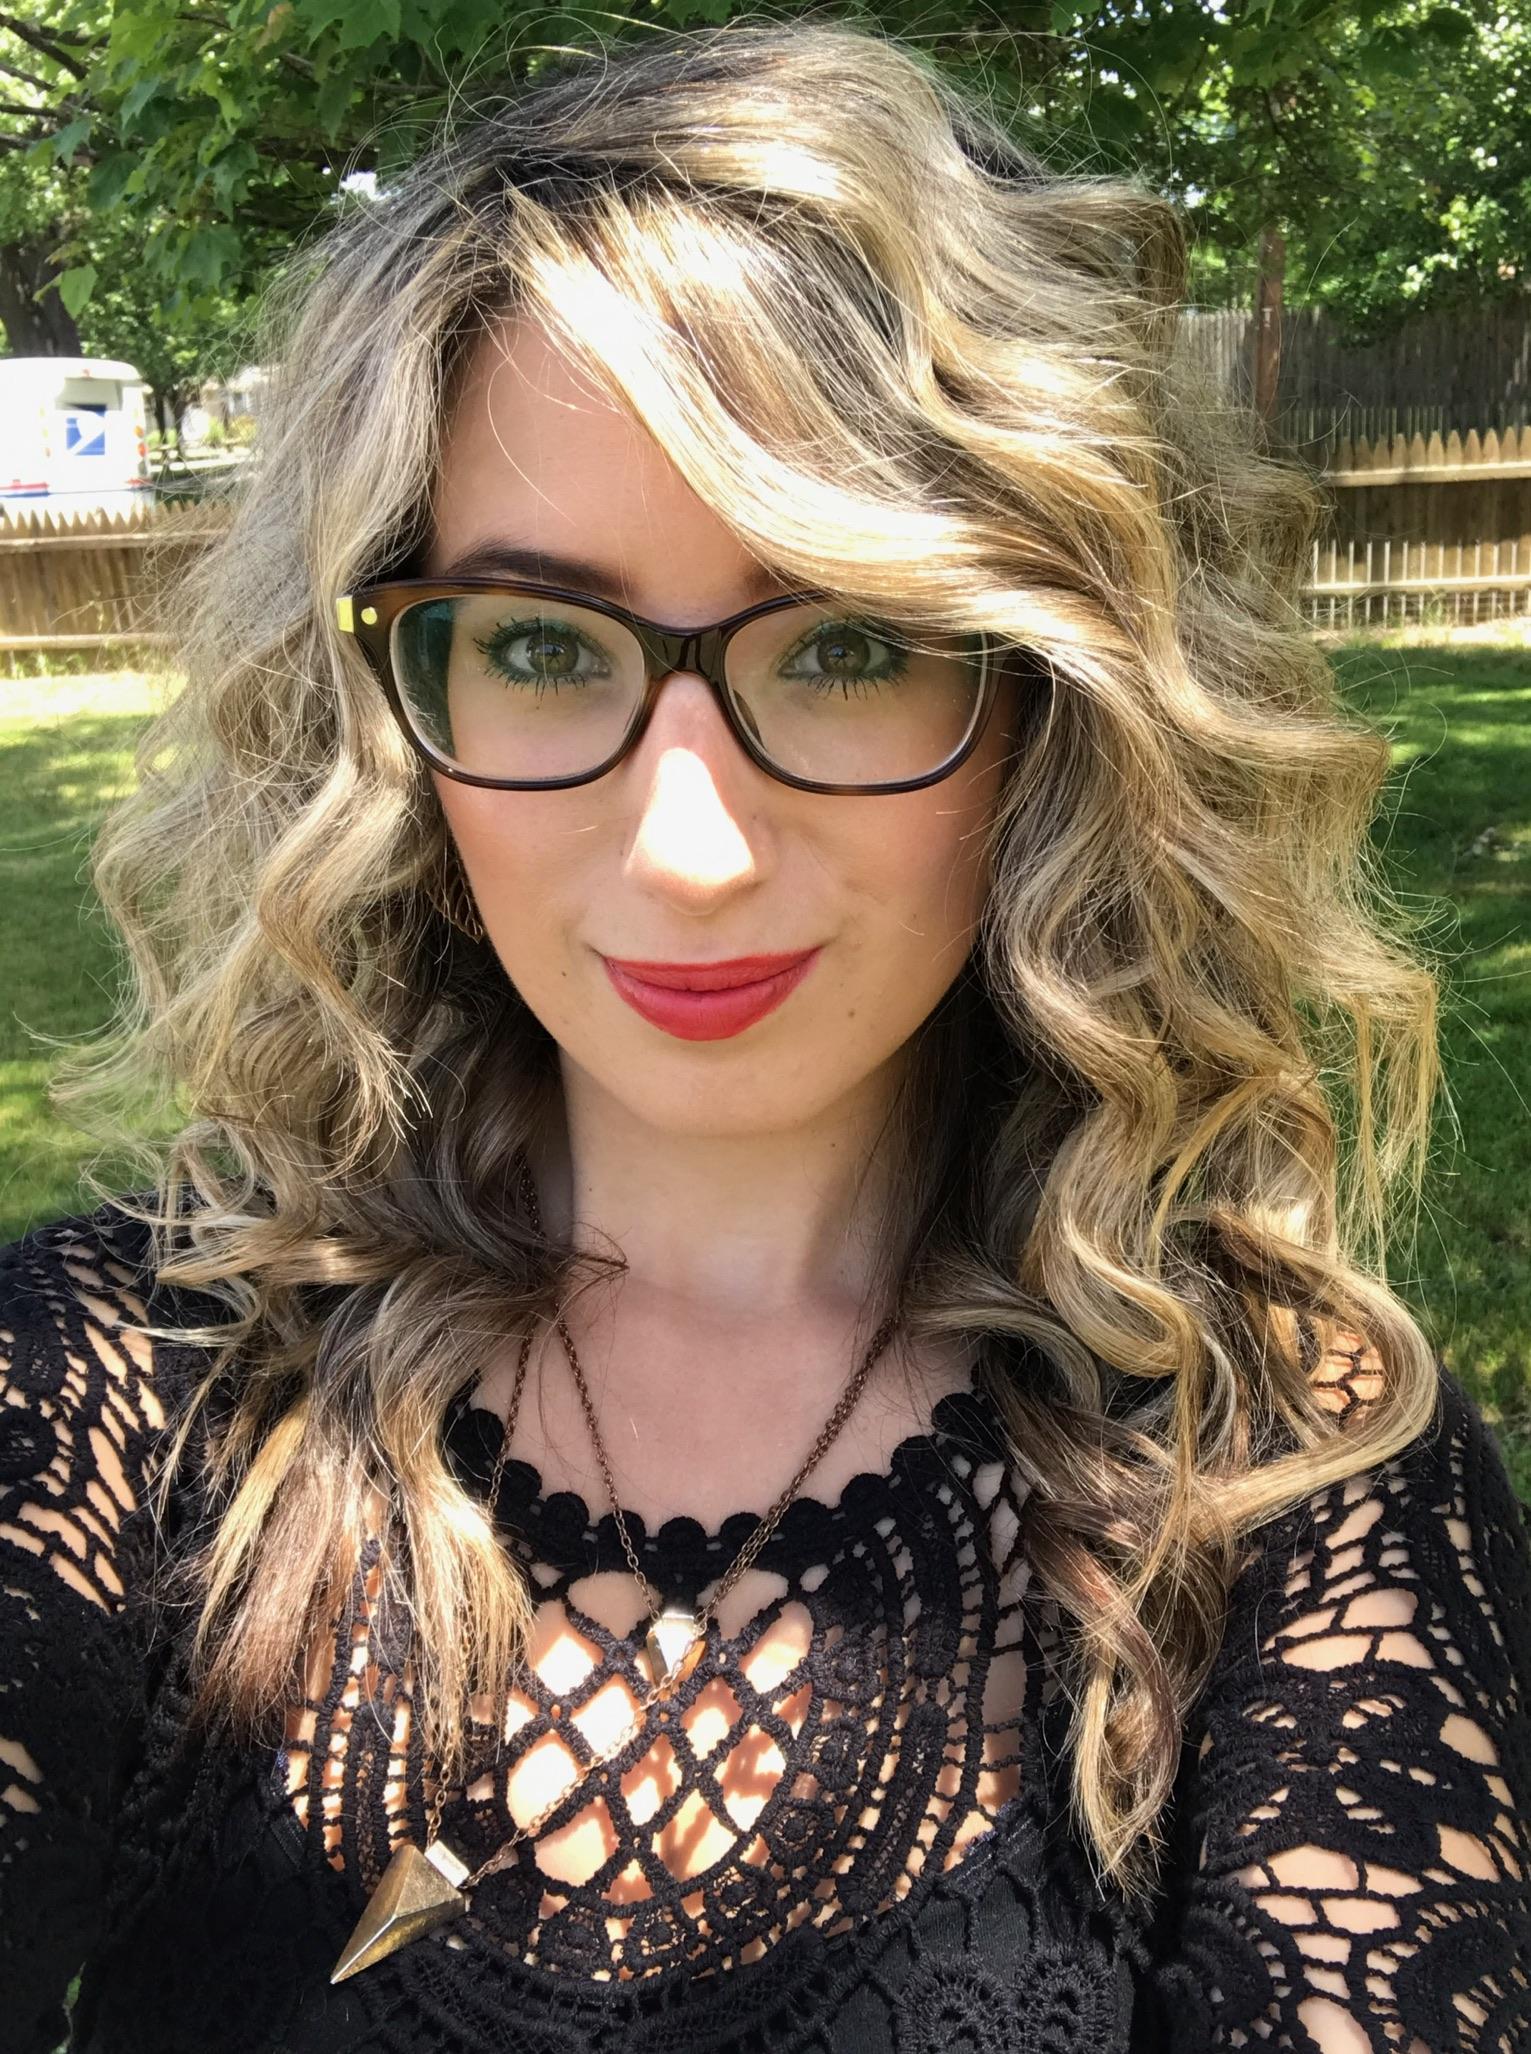 Alexandra Wilson (@alexandralee1016)